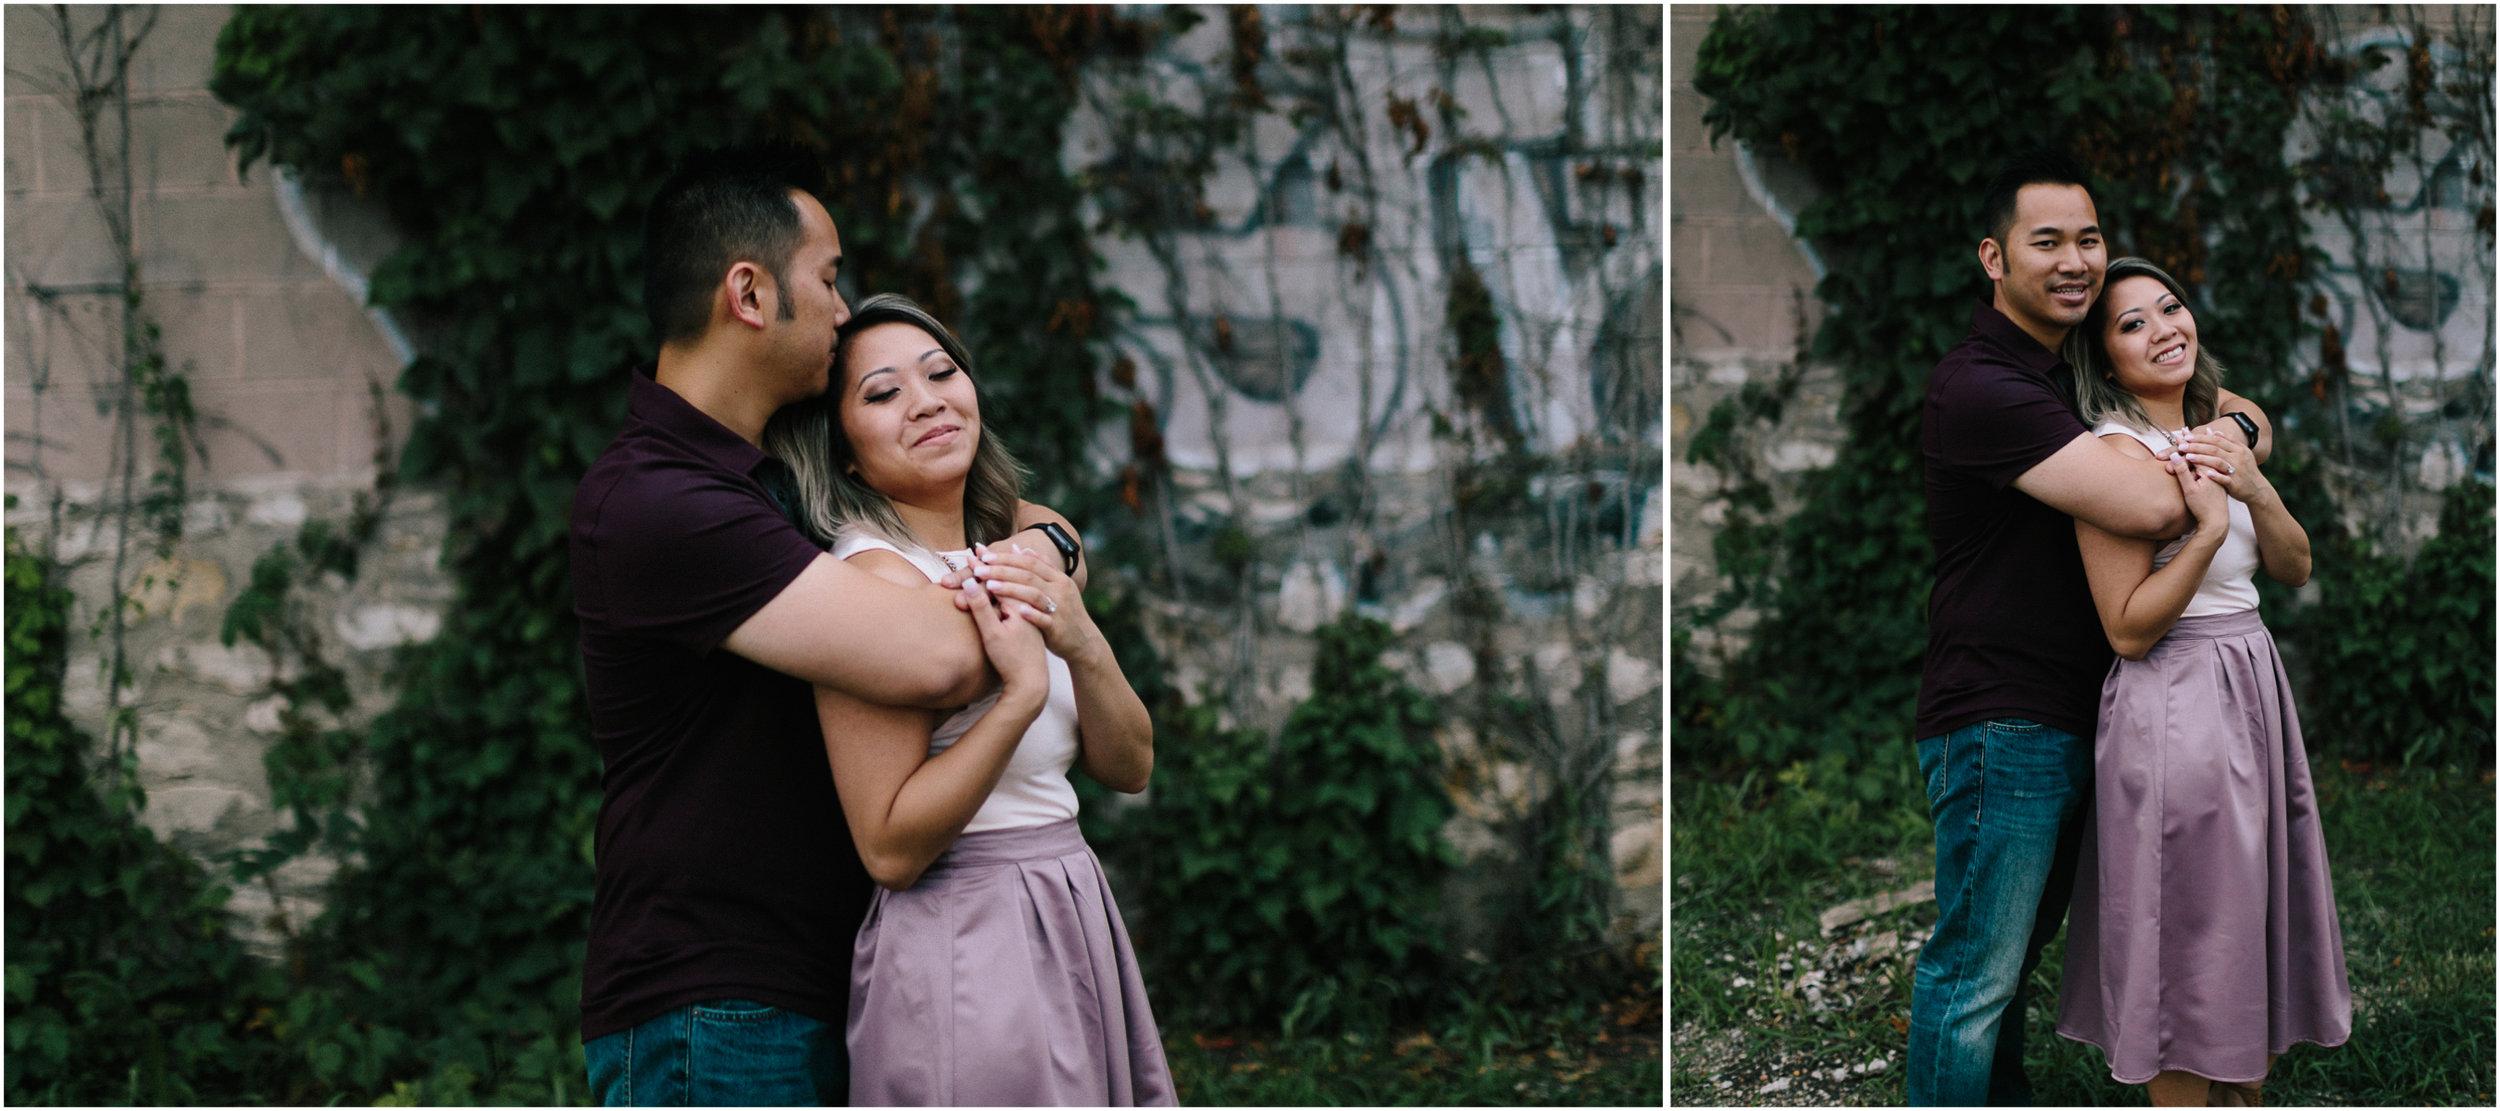 alyssa barletter photography loose park west bottoms engagement session dogs-17.jpg